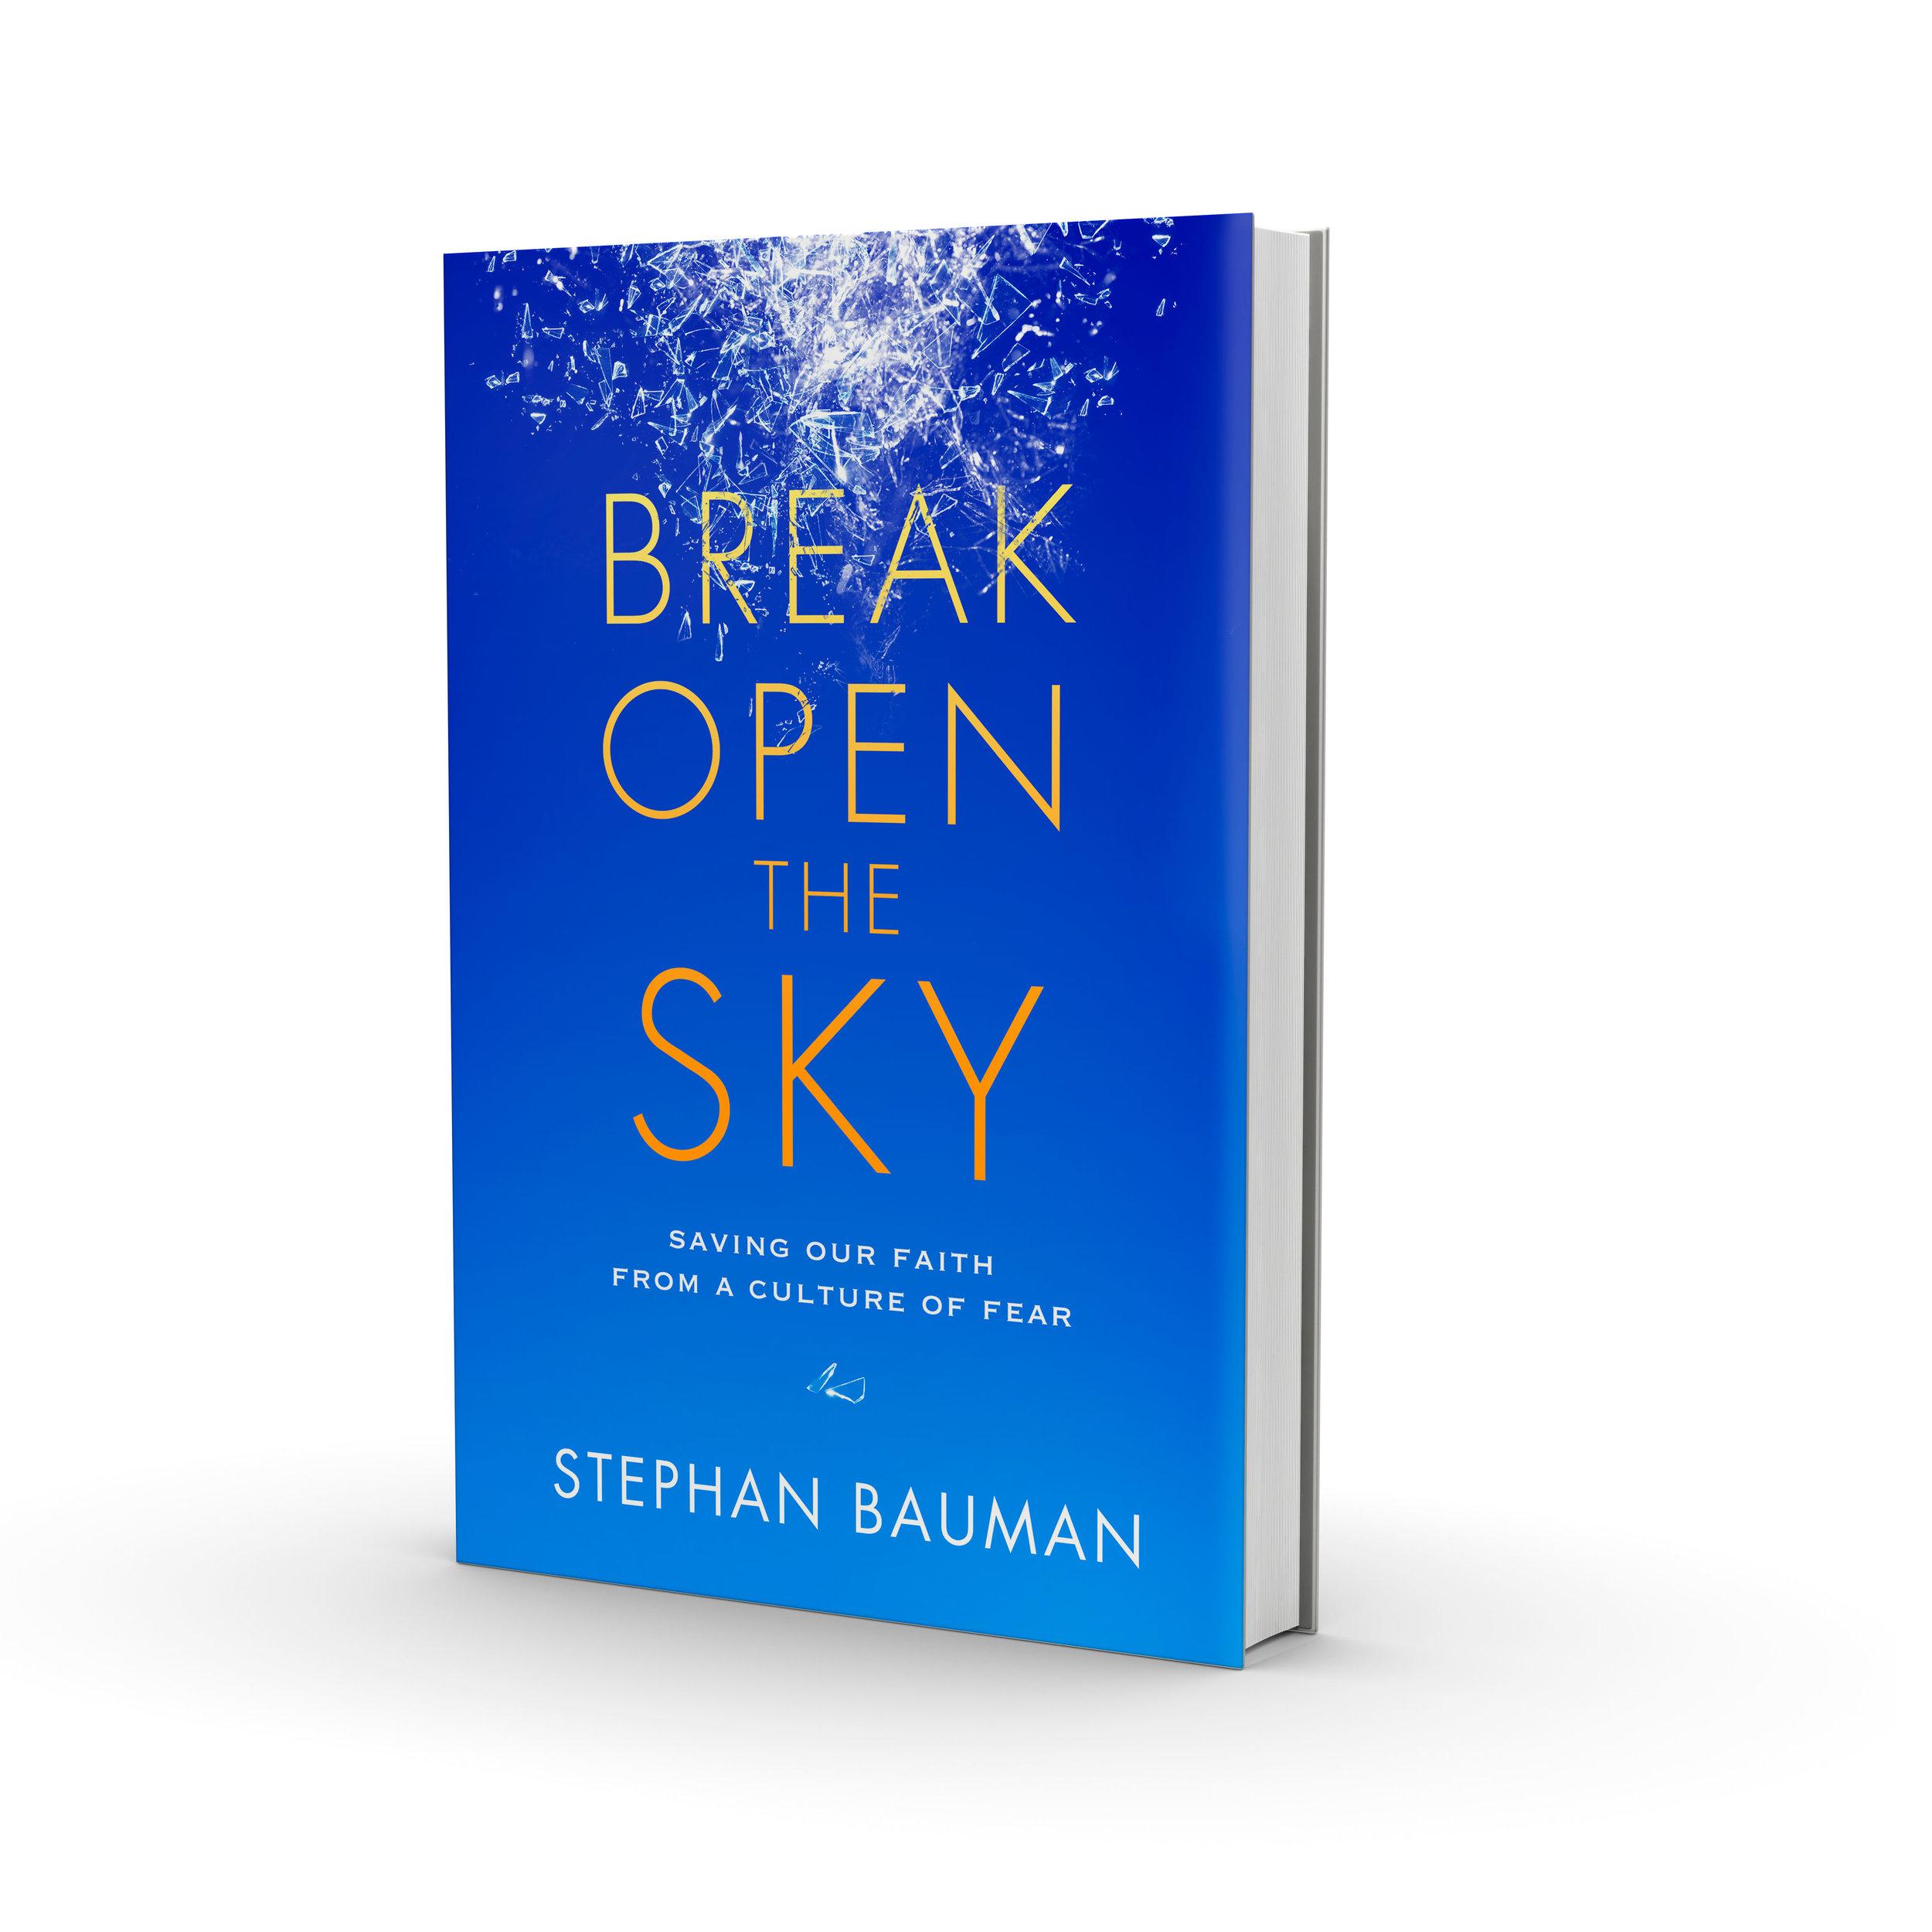 BREAK OPEN THE SKY , a new book by Stephan Bauman